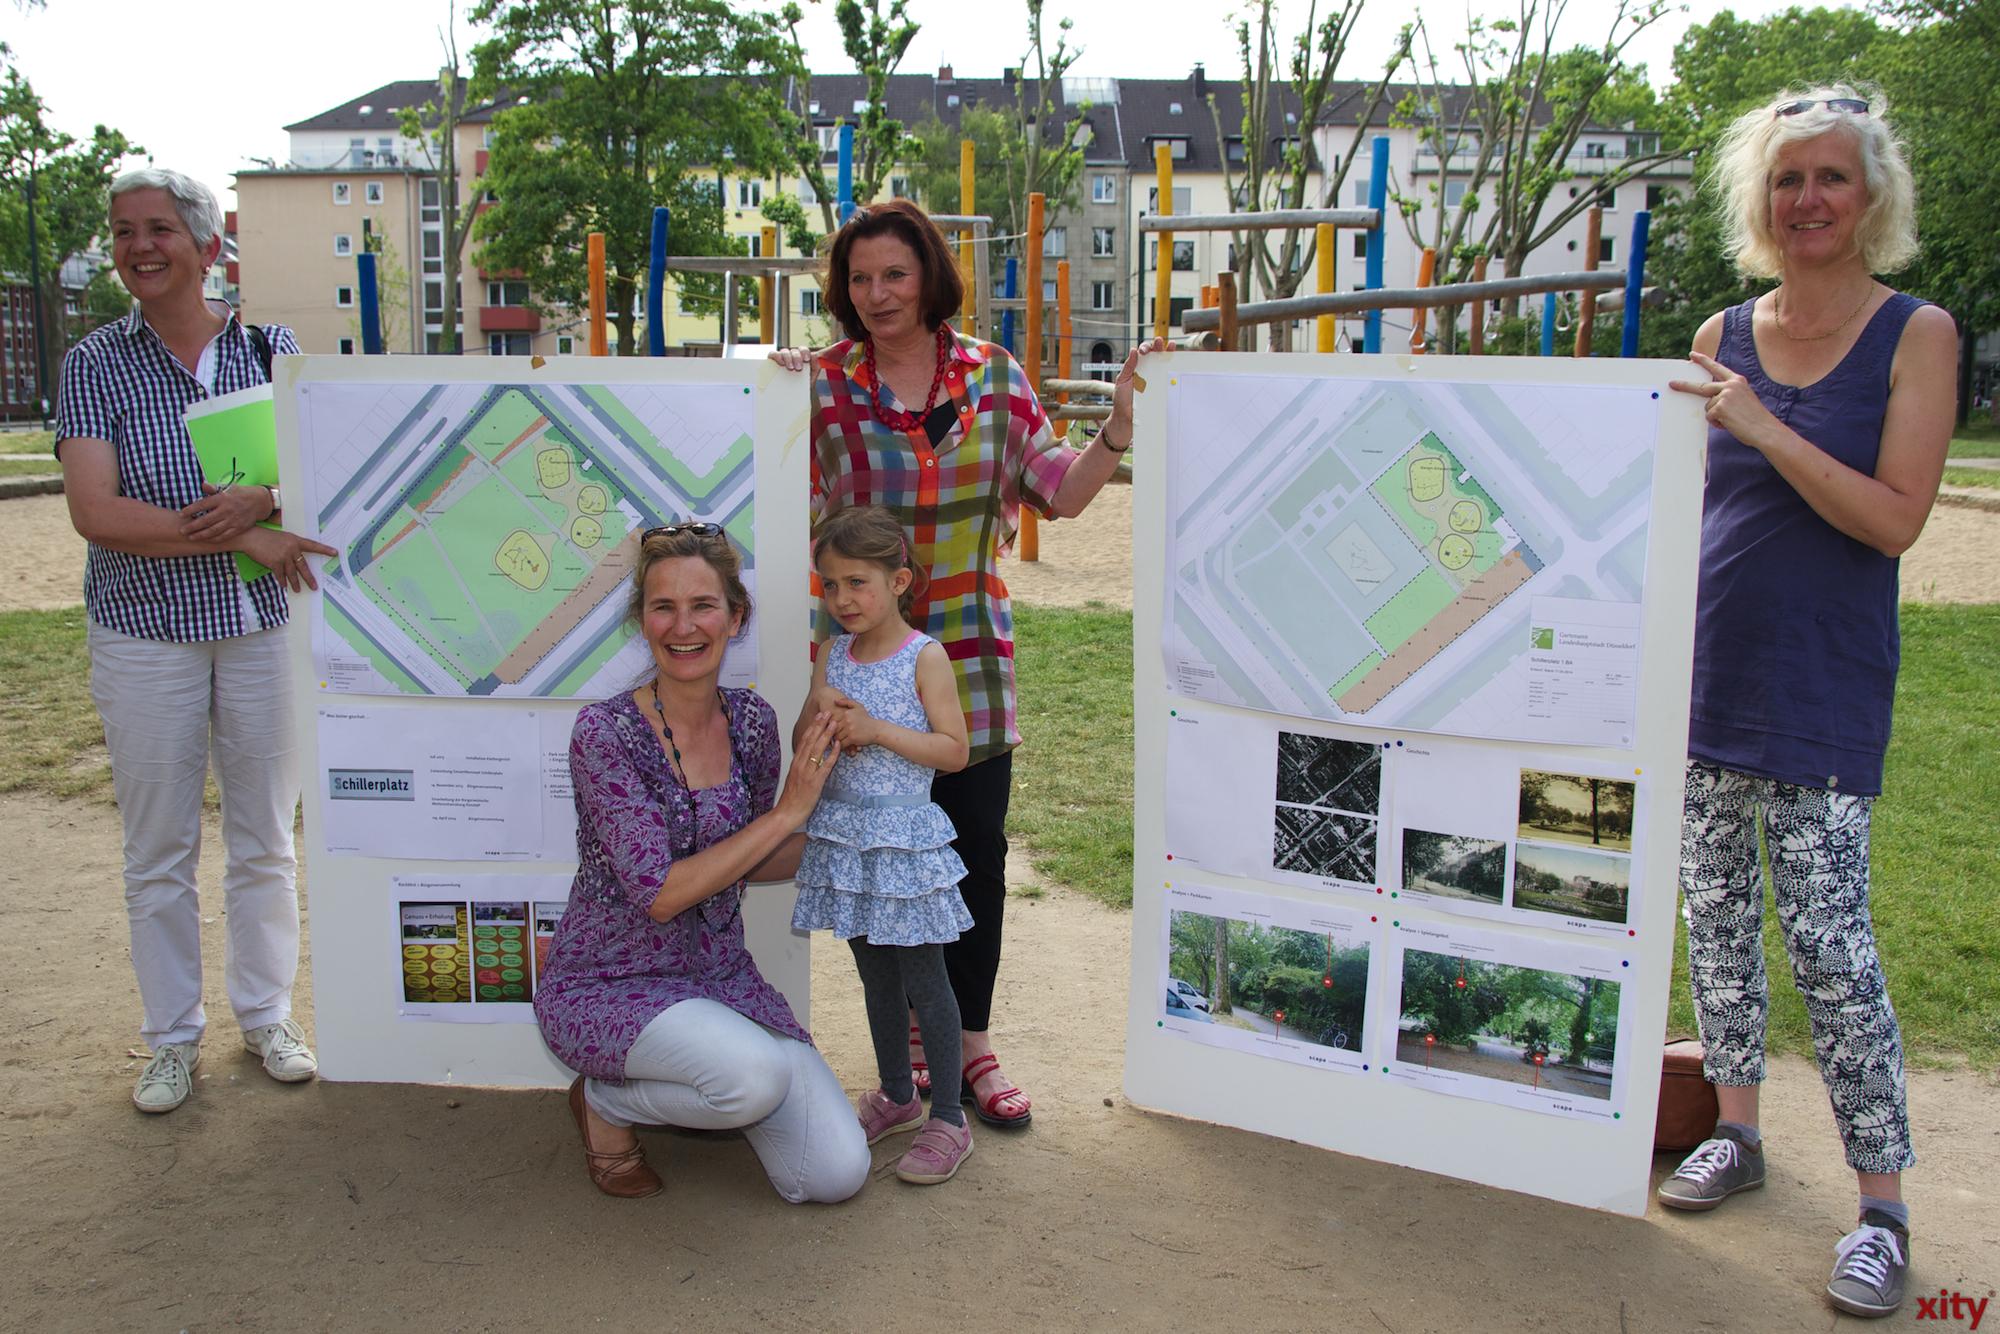 Gartenamtsleiterin Doris Törkel, Gründezernentin Helga Stulgies,  Hiltrud Lintel mit ihrer Tochter Inga (Foto: xity)